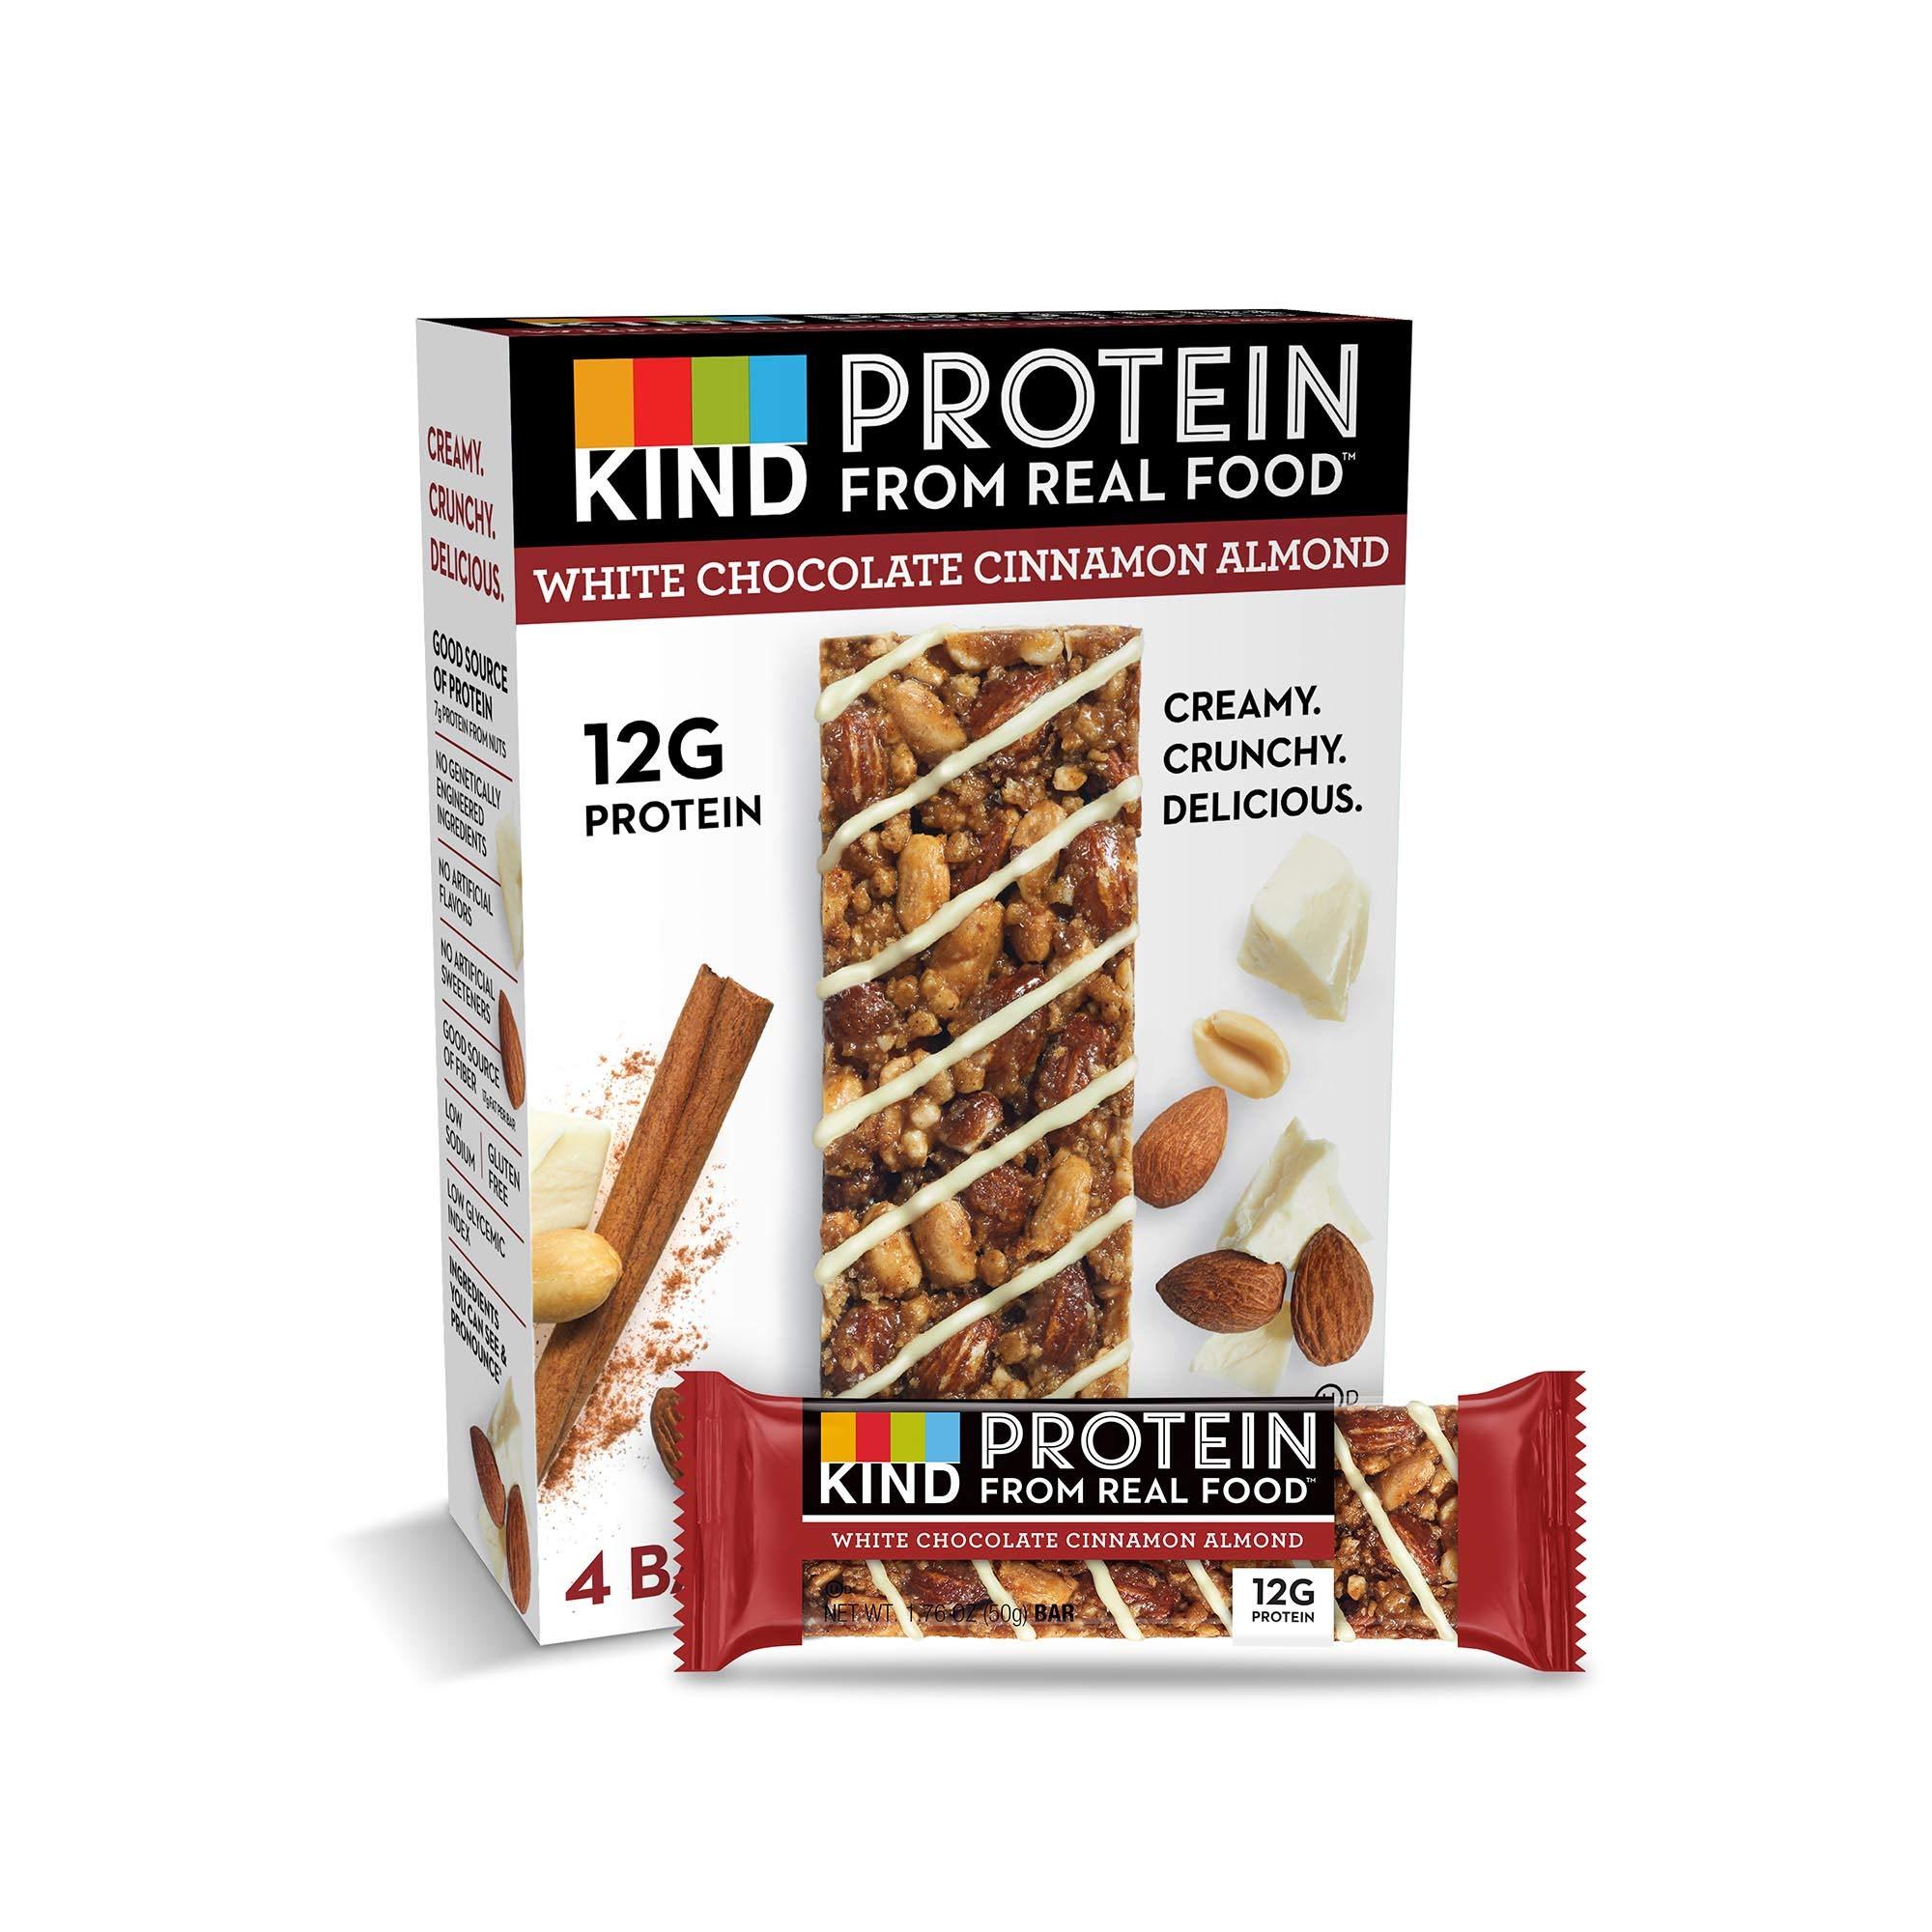 KIND Protein Bars, White Chocolate Cinnamon Almond, Gluten Free, 12g Protein,1.76oz, 24 count